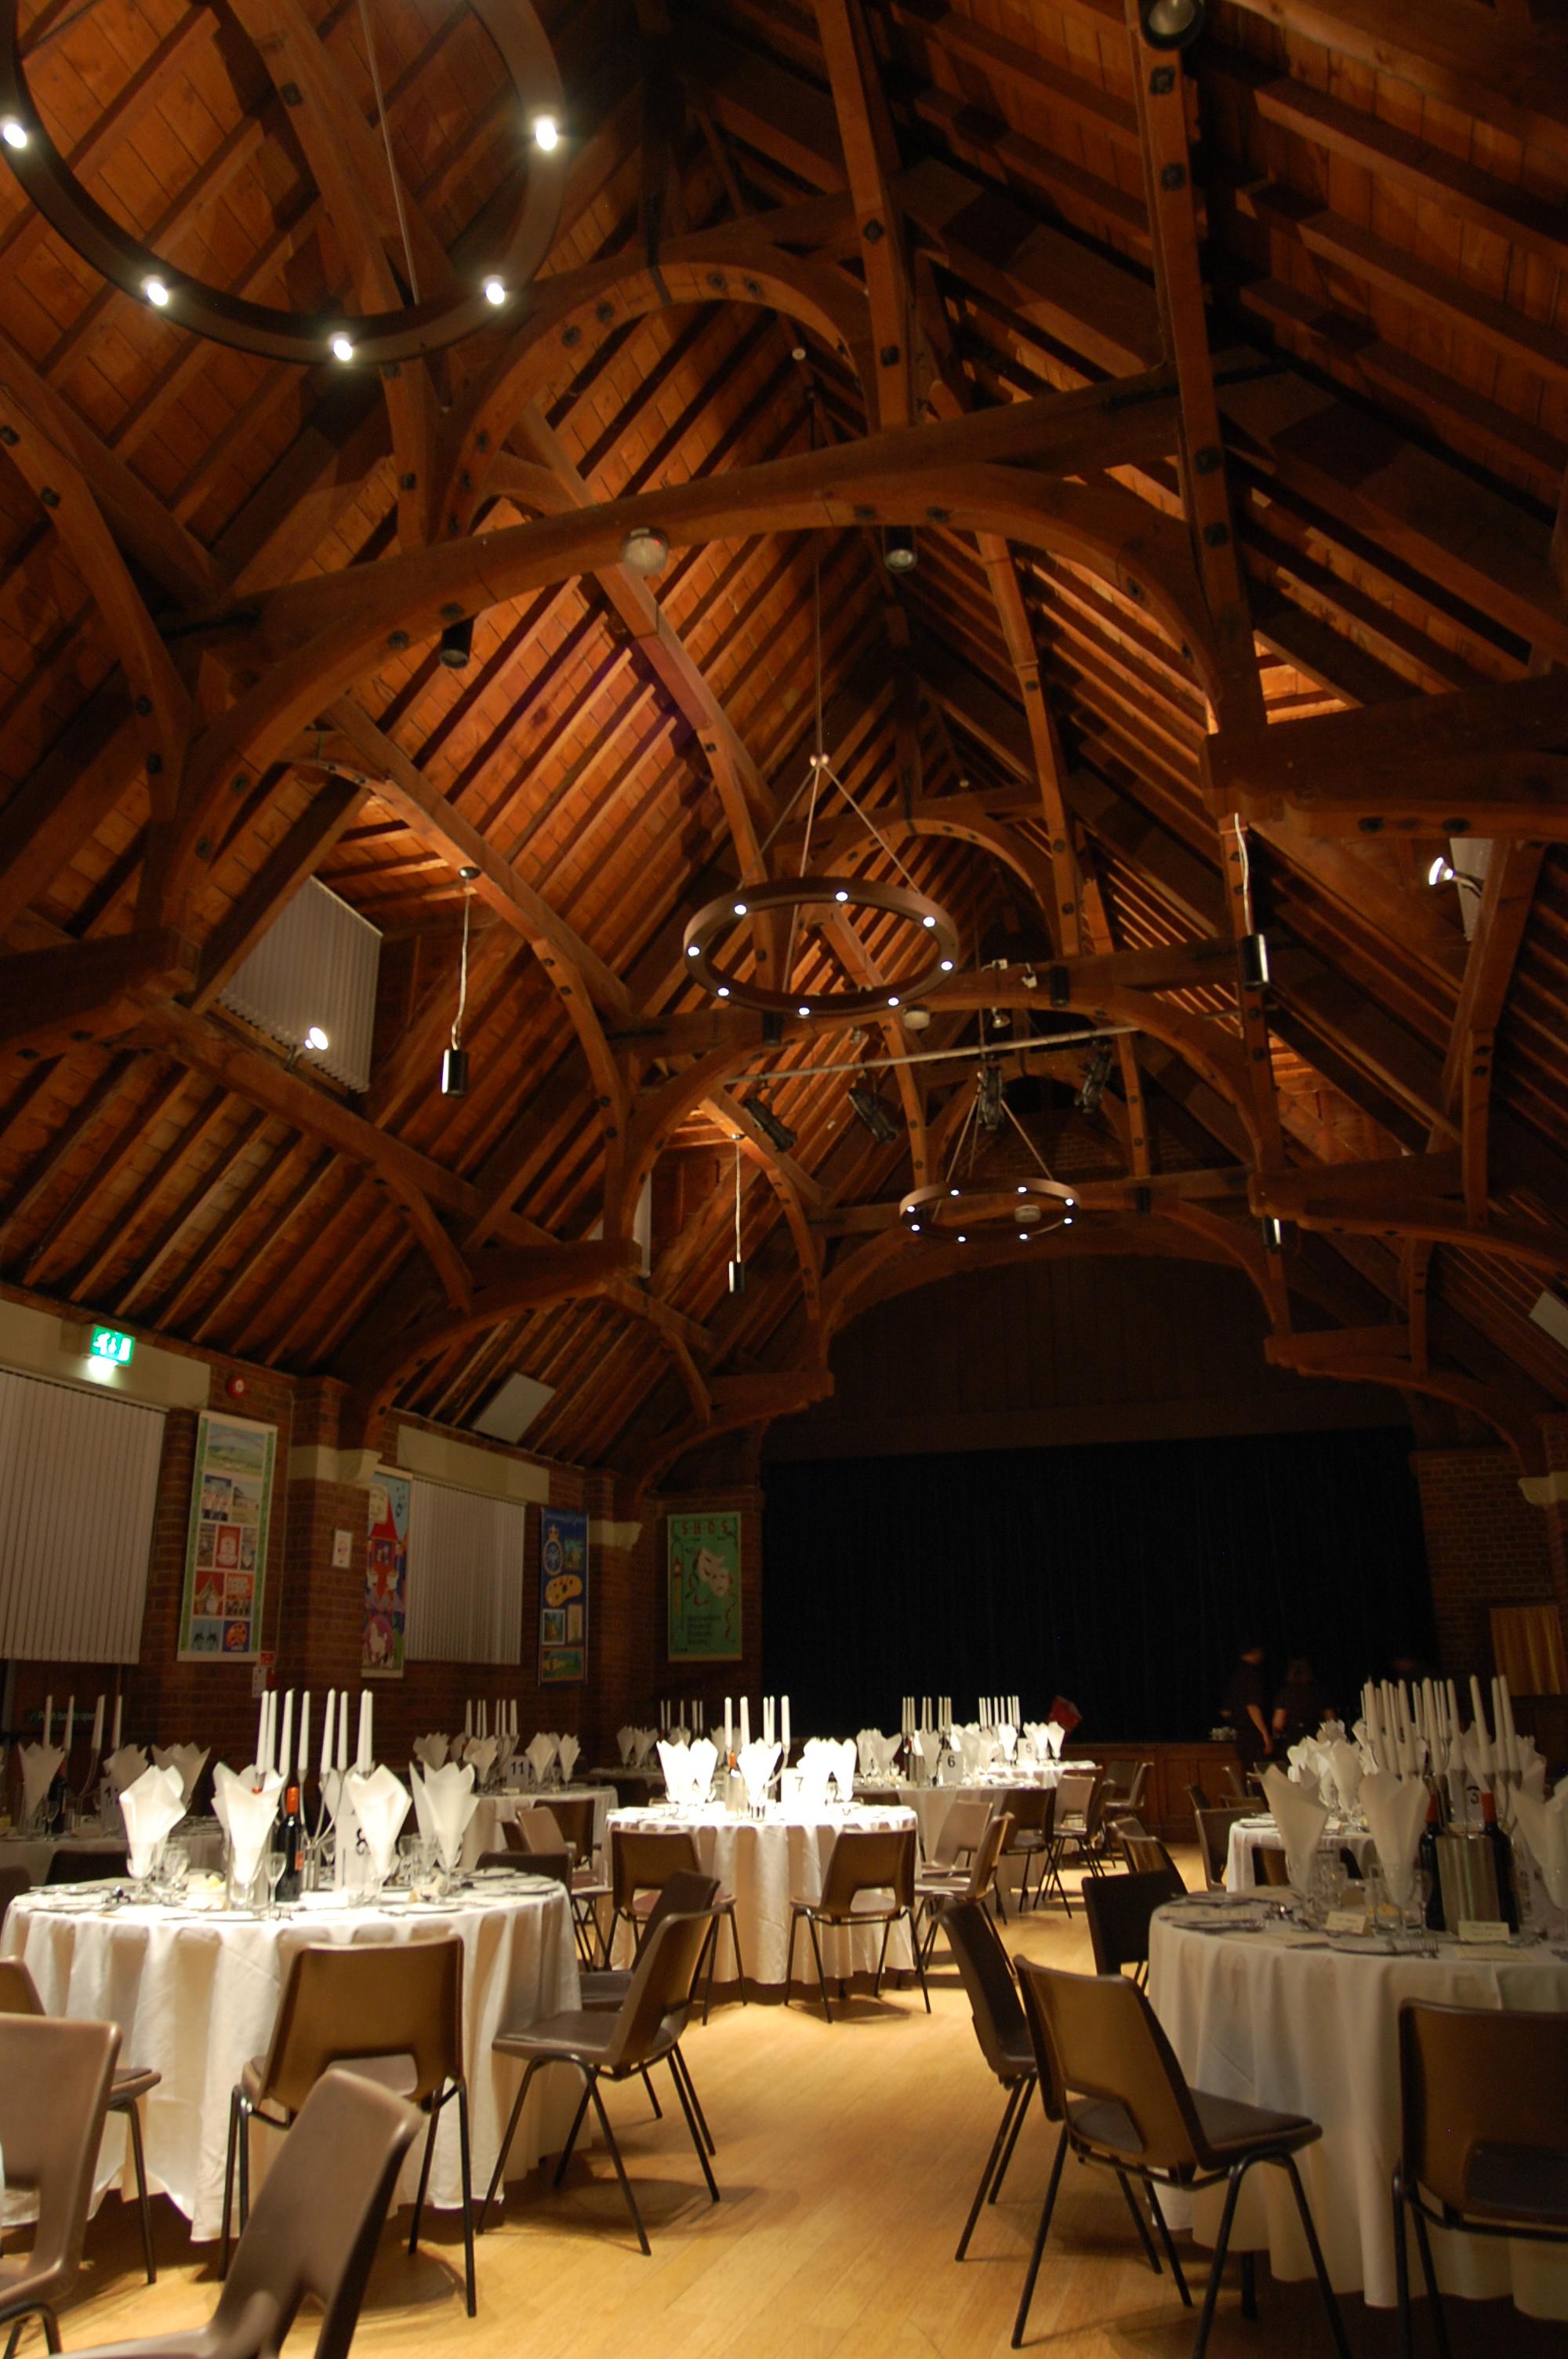 Memorial Hall, Oxfordshire